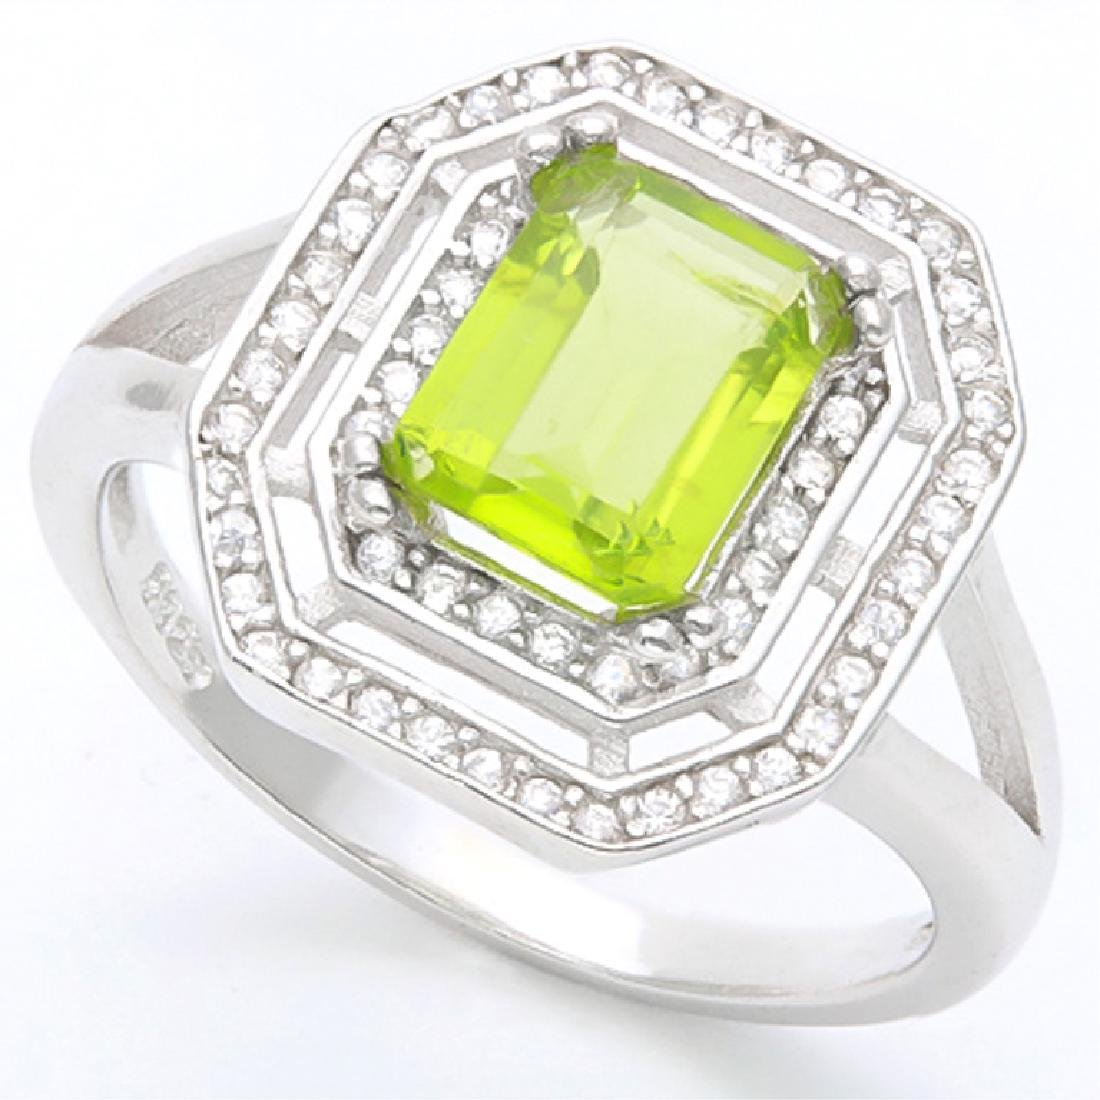 SMASHING DIAMOND AND 3CT PERIDOT STERLING RING